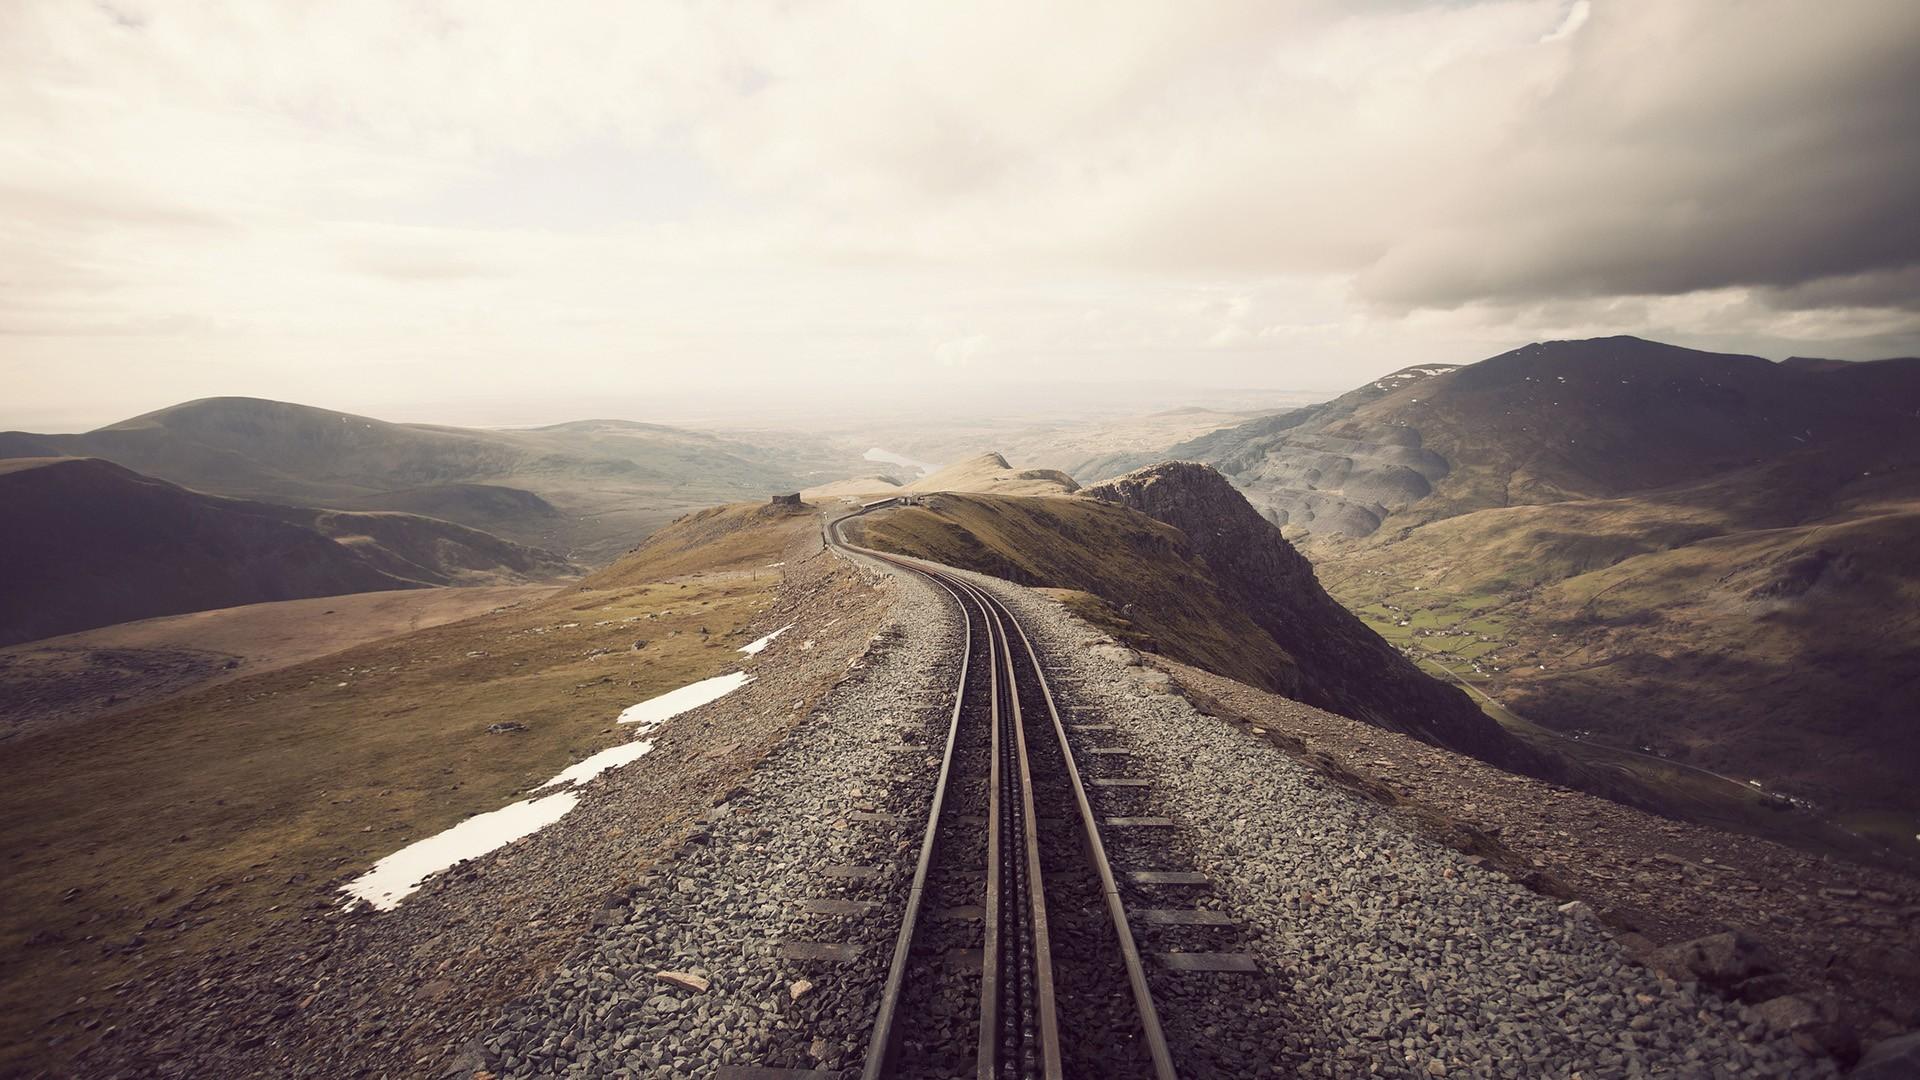 General 1920x1080 mountains train railway railroad track landscape sepia beige mist snow